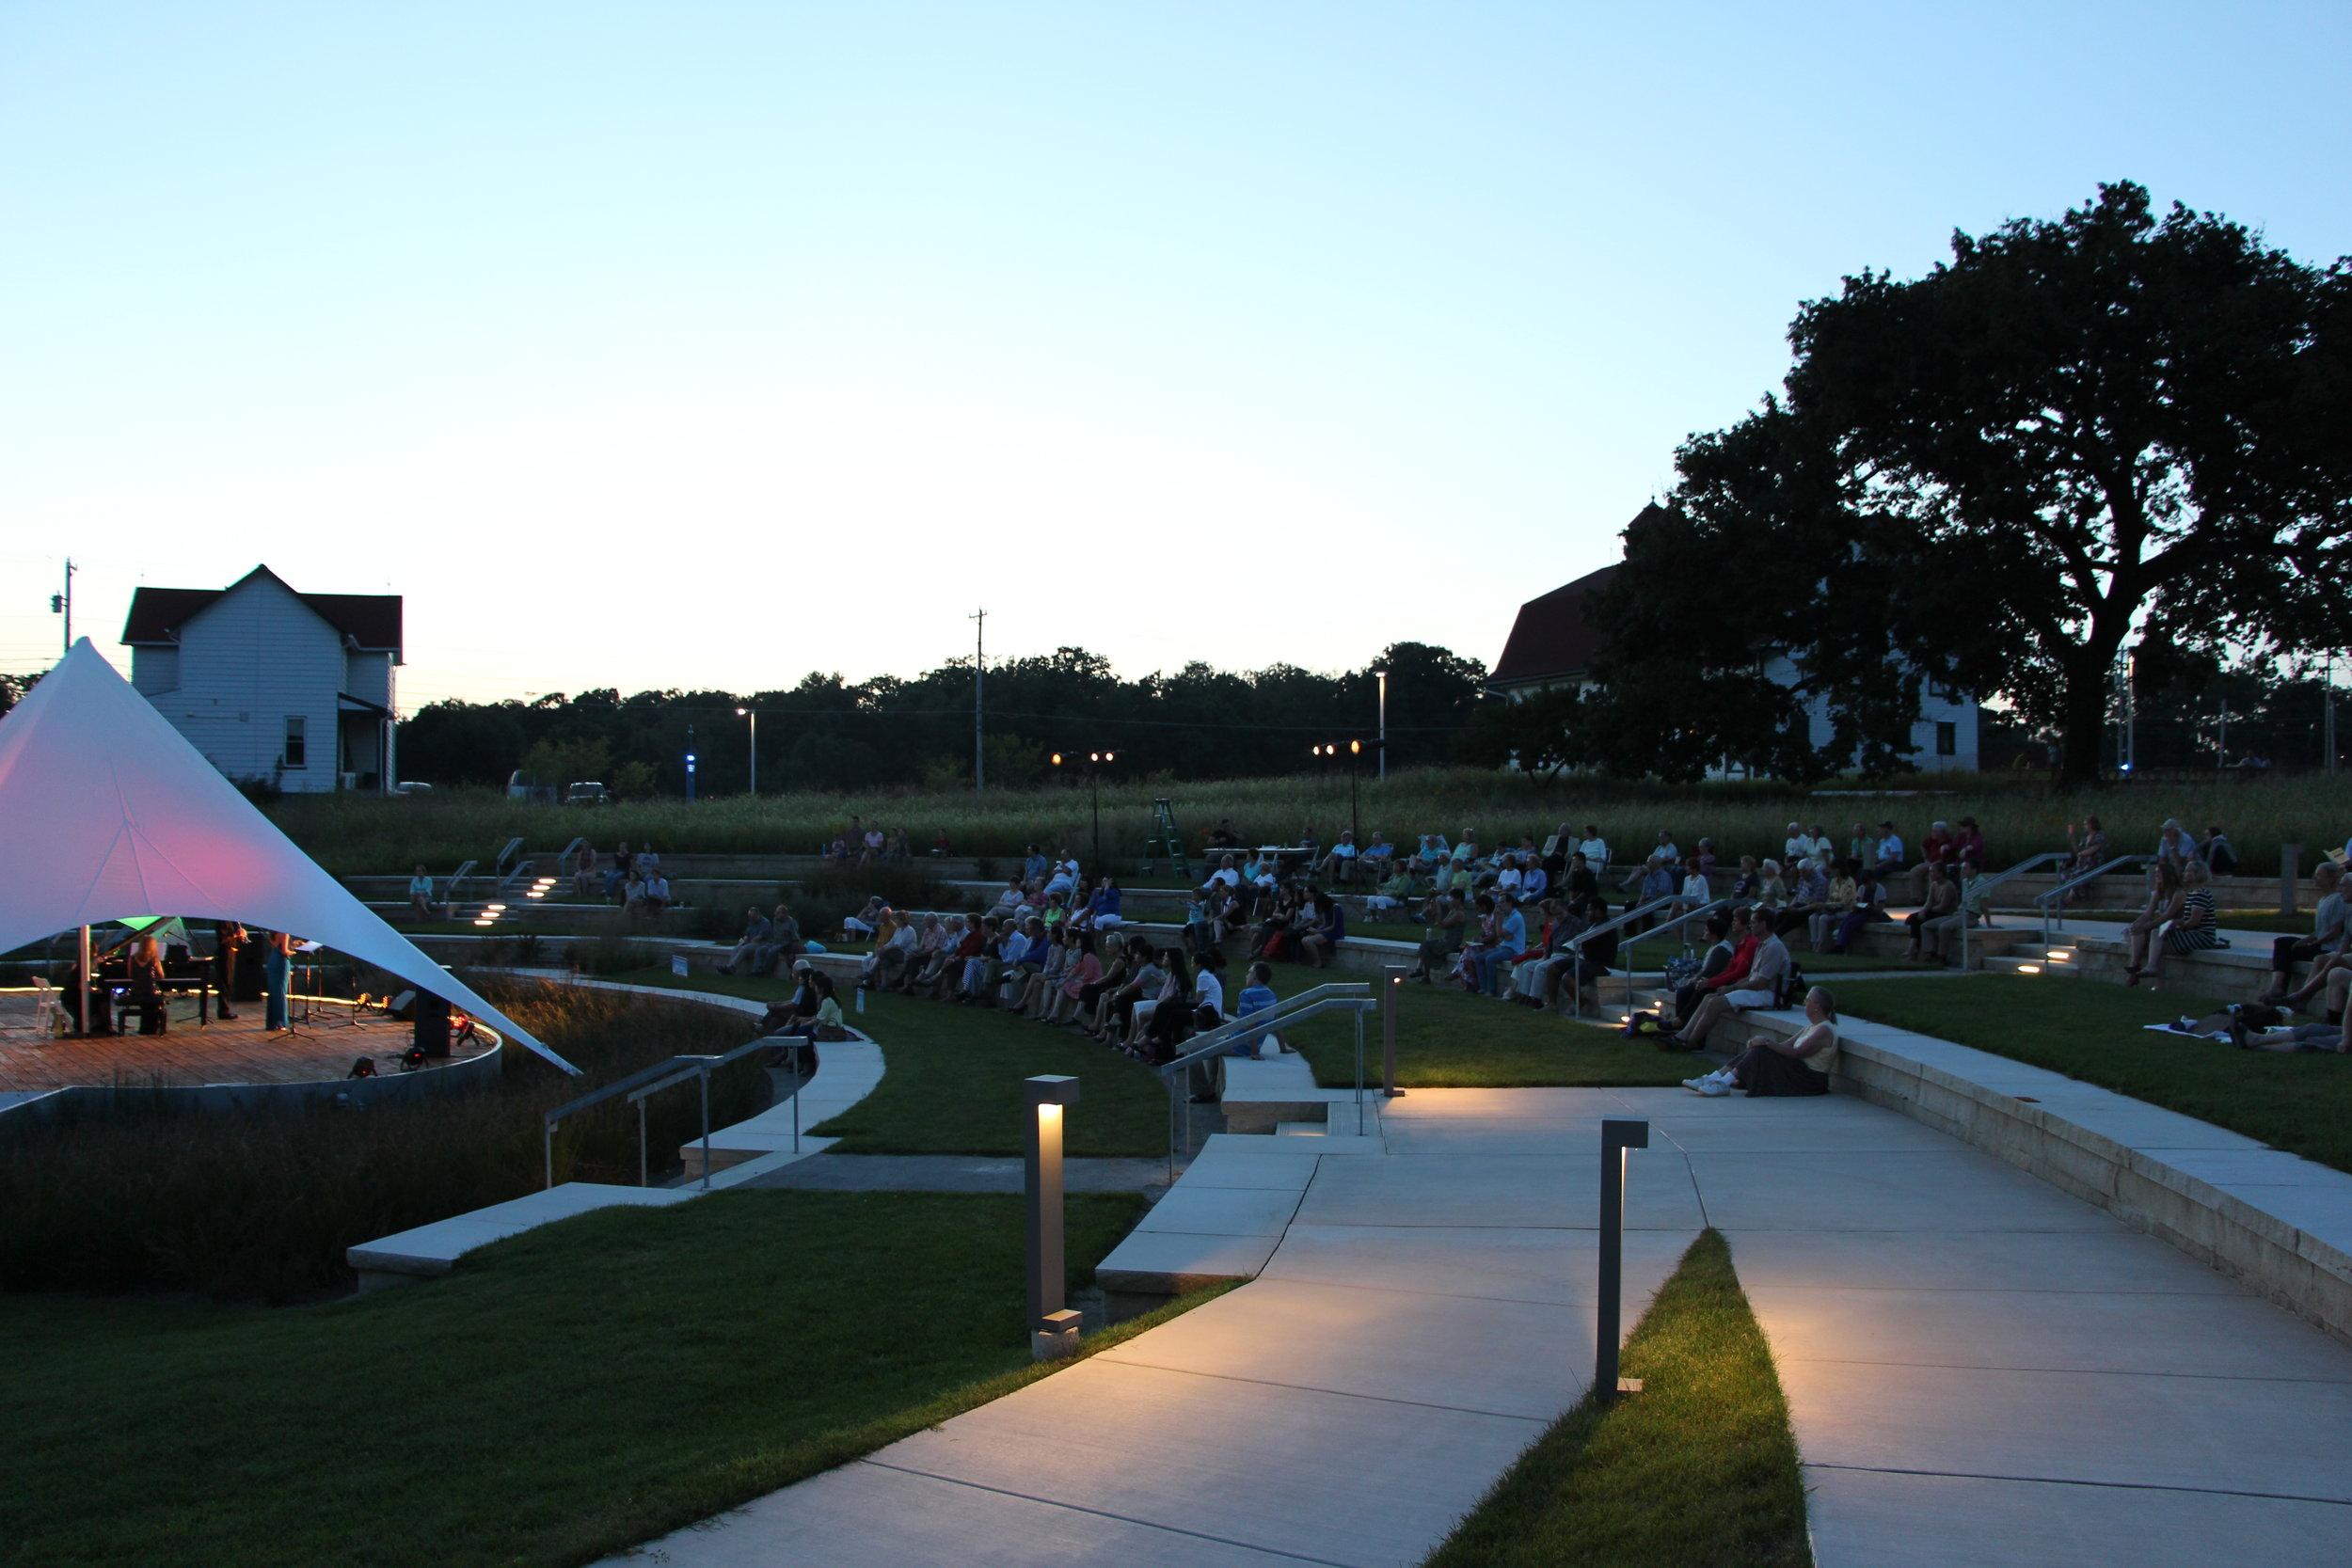 Hilda M. Willis Amphitheater